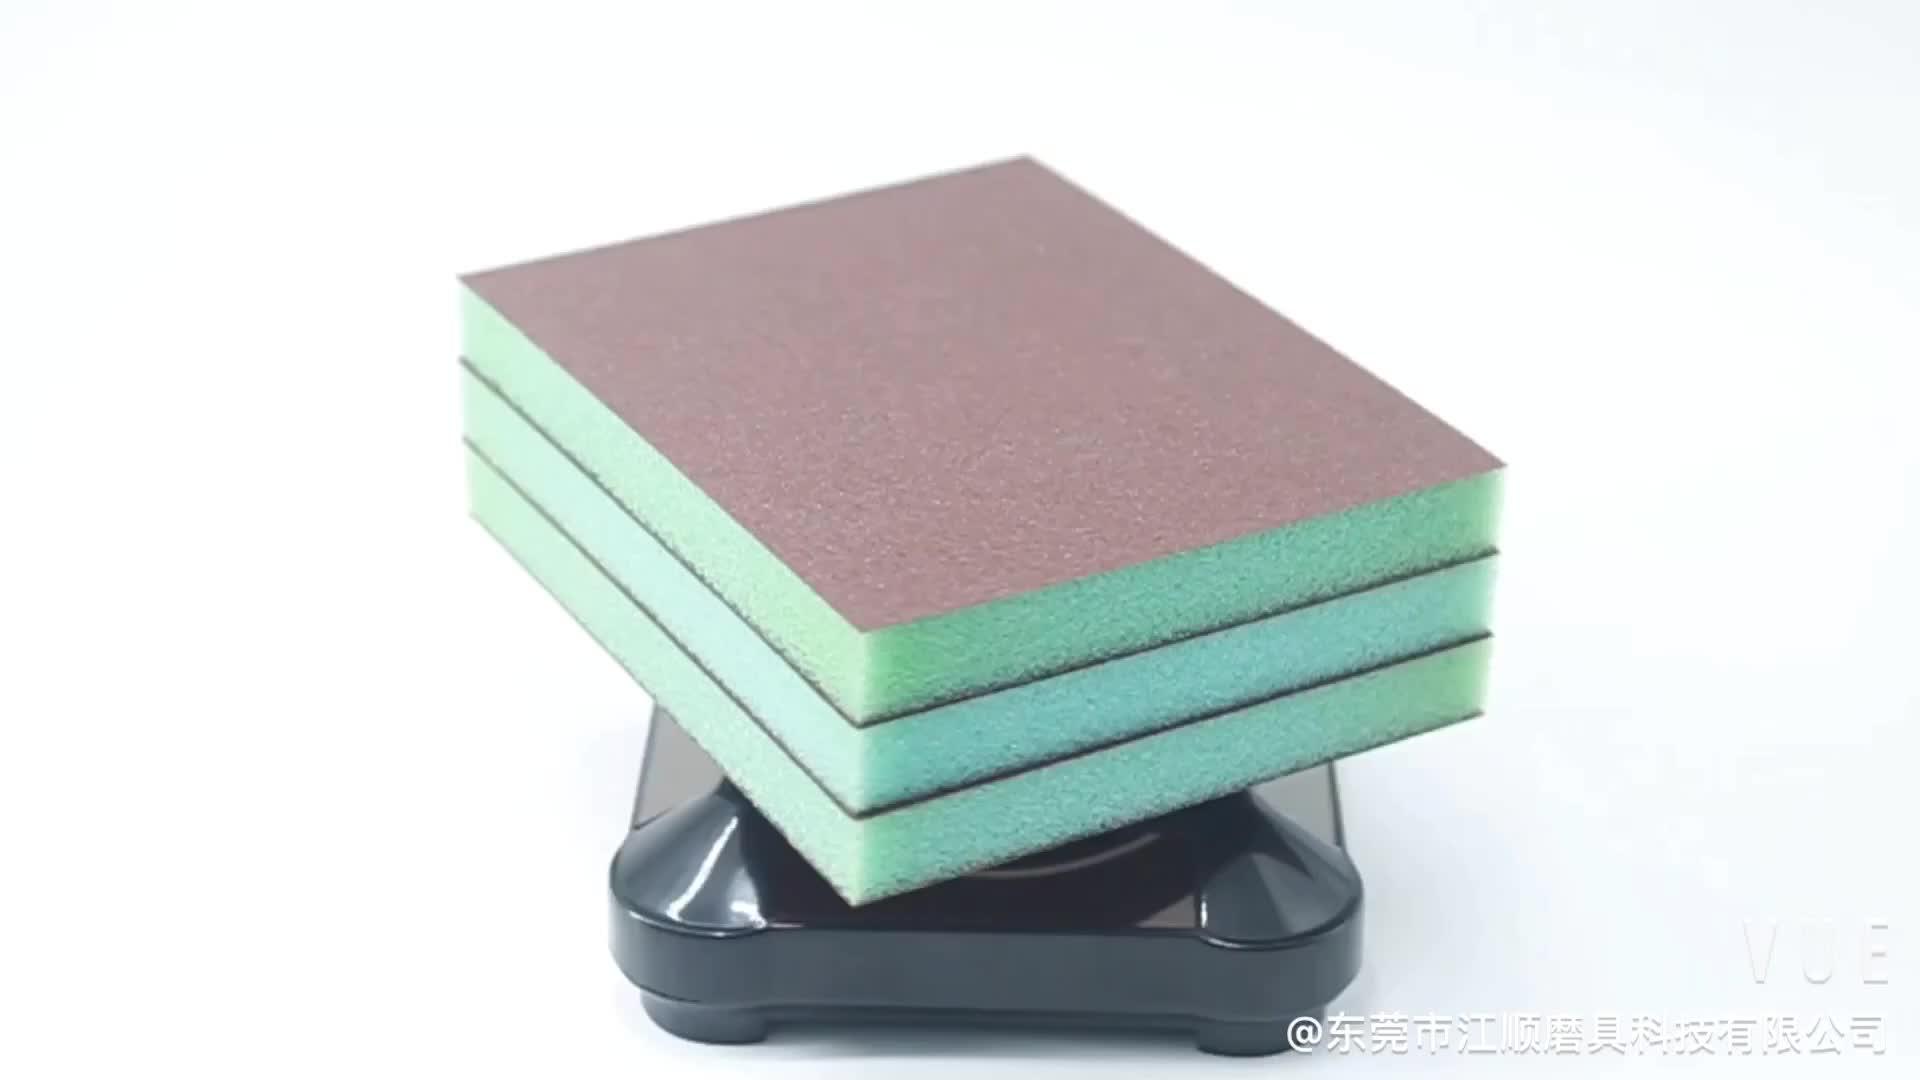 Aluminium Oxide Schurende Schuren Spons Blok